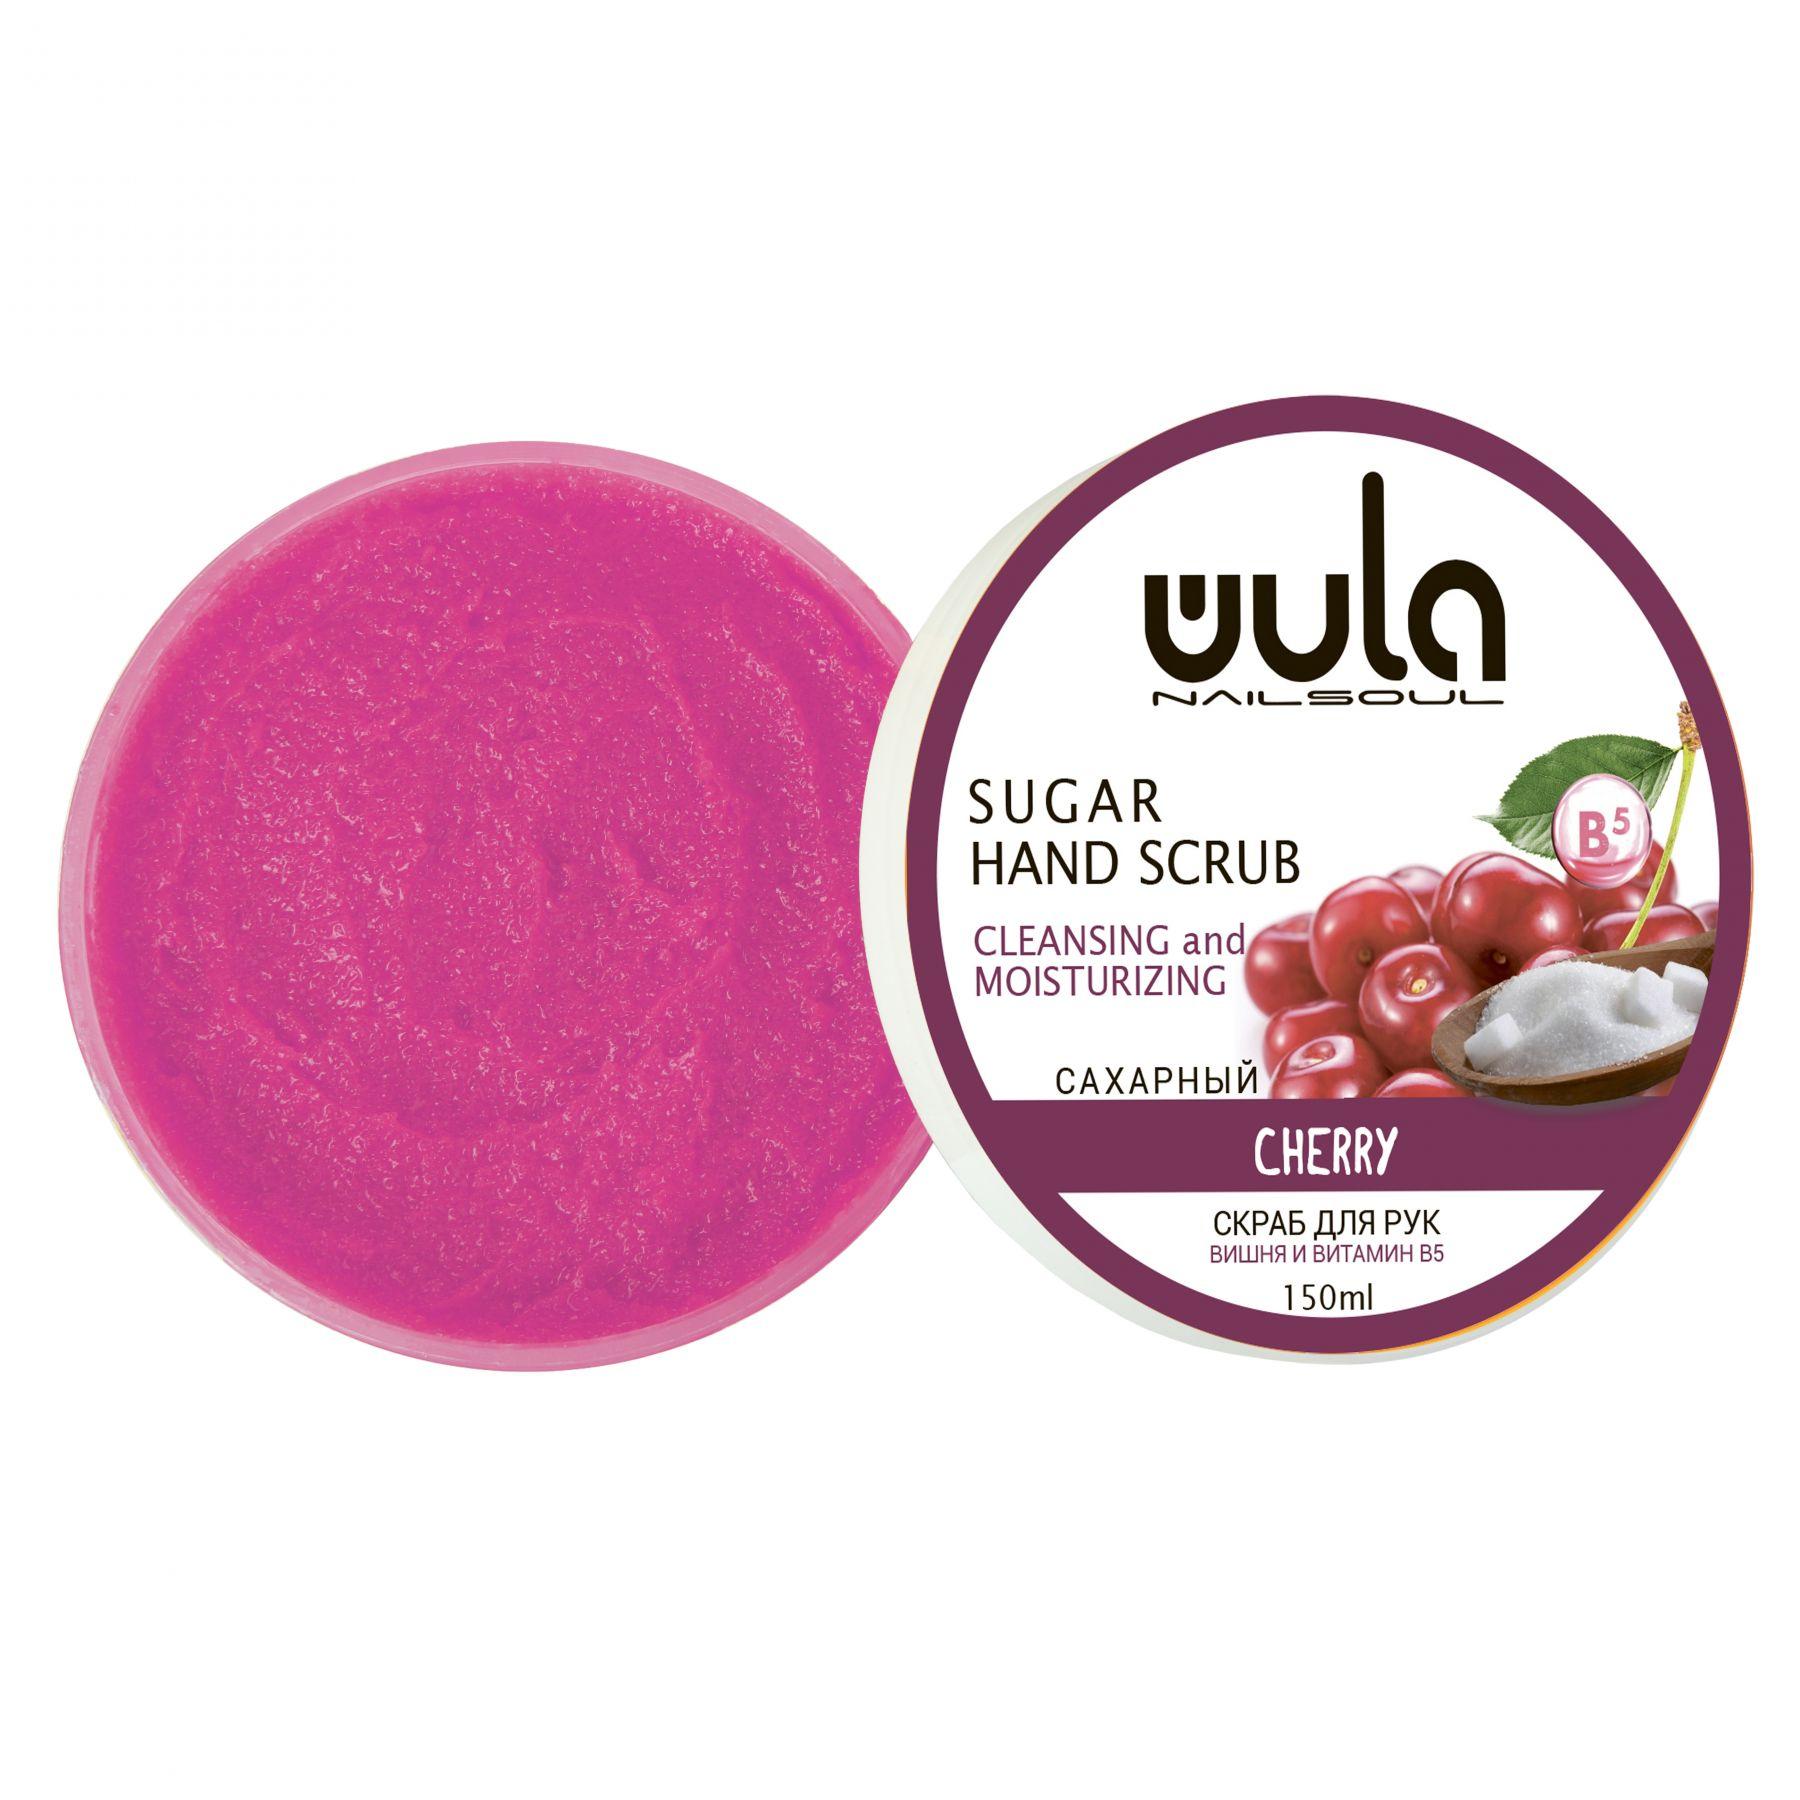 Wula nailsoul сахарный скраб для рук Вишня и витамин B5 150 мл  - Купить